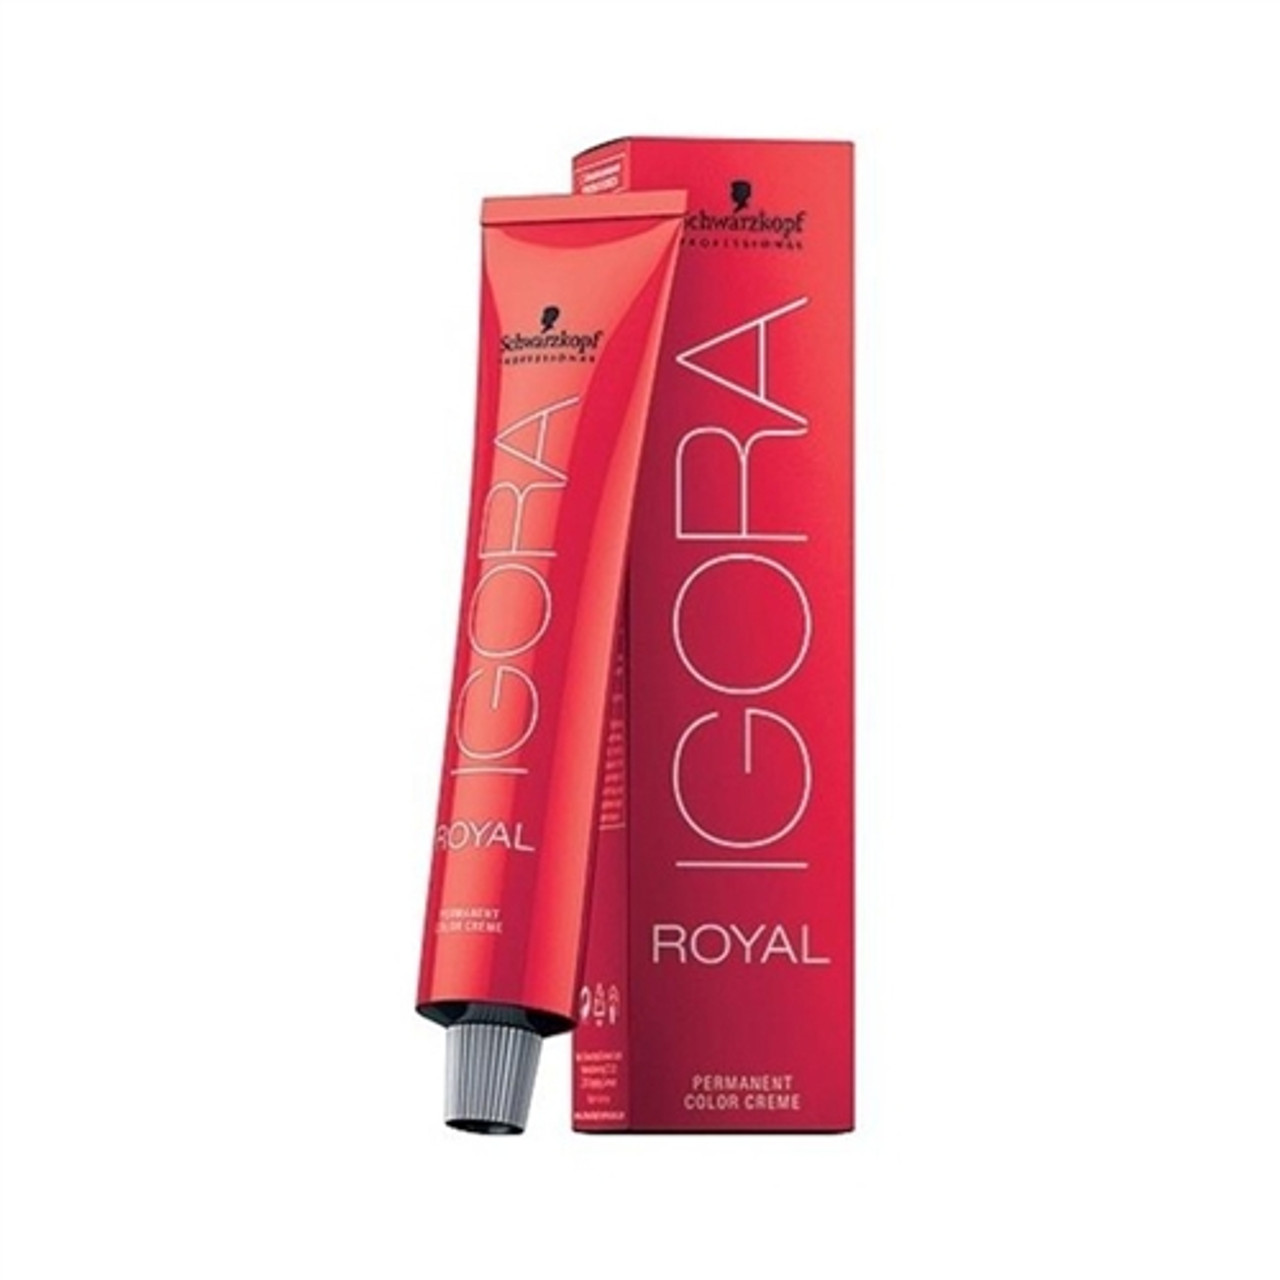 1-0 Black Igora Royal Permanent Color Creme -